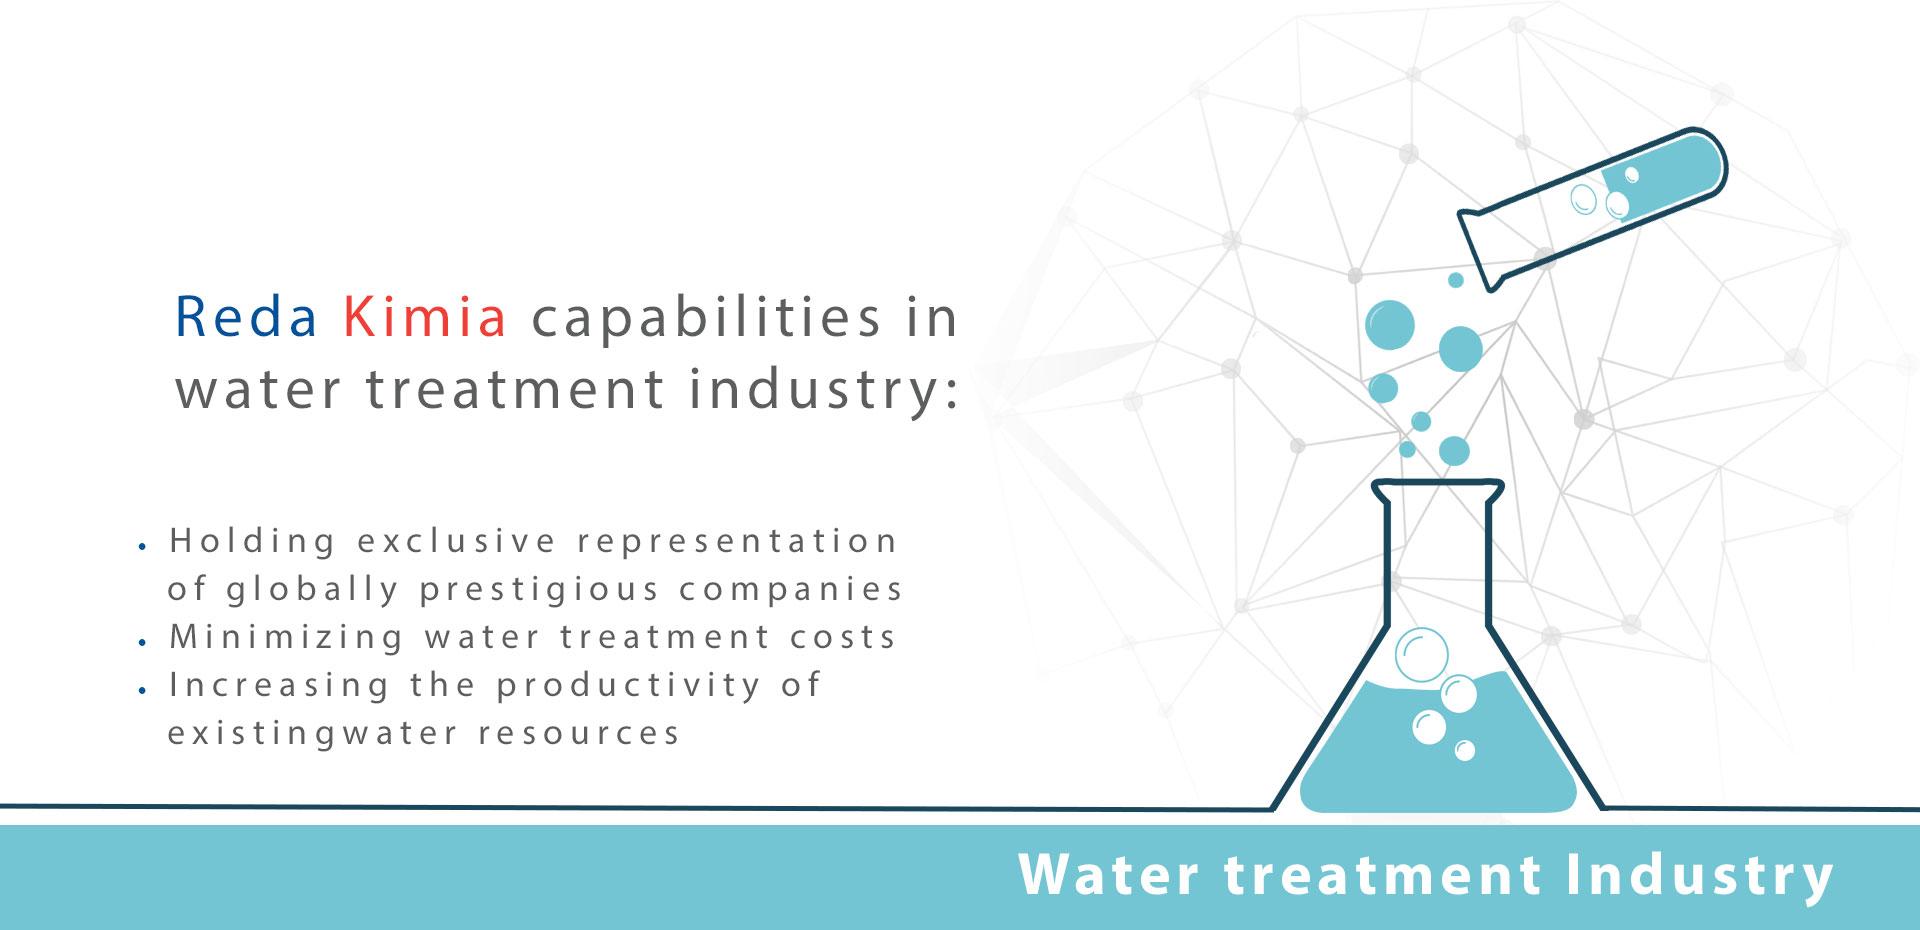 صنعت تصفیه آب